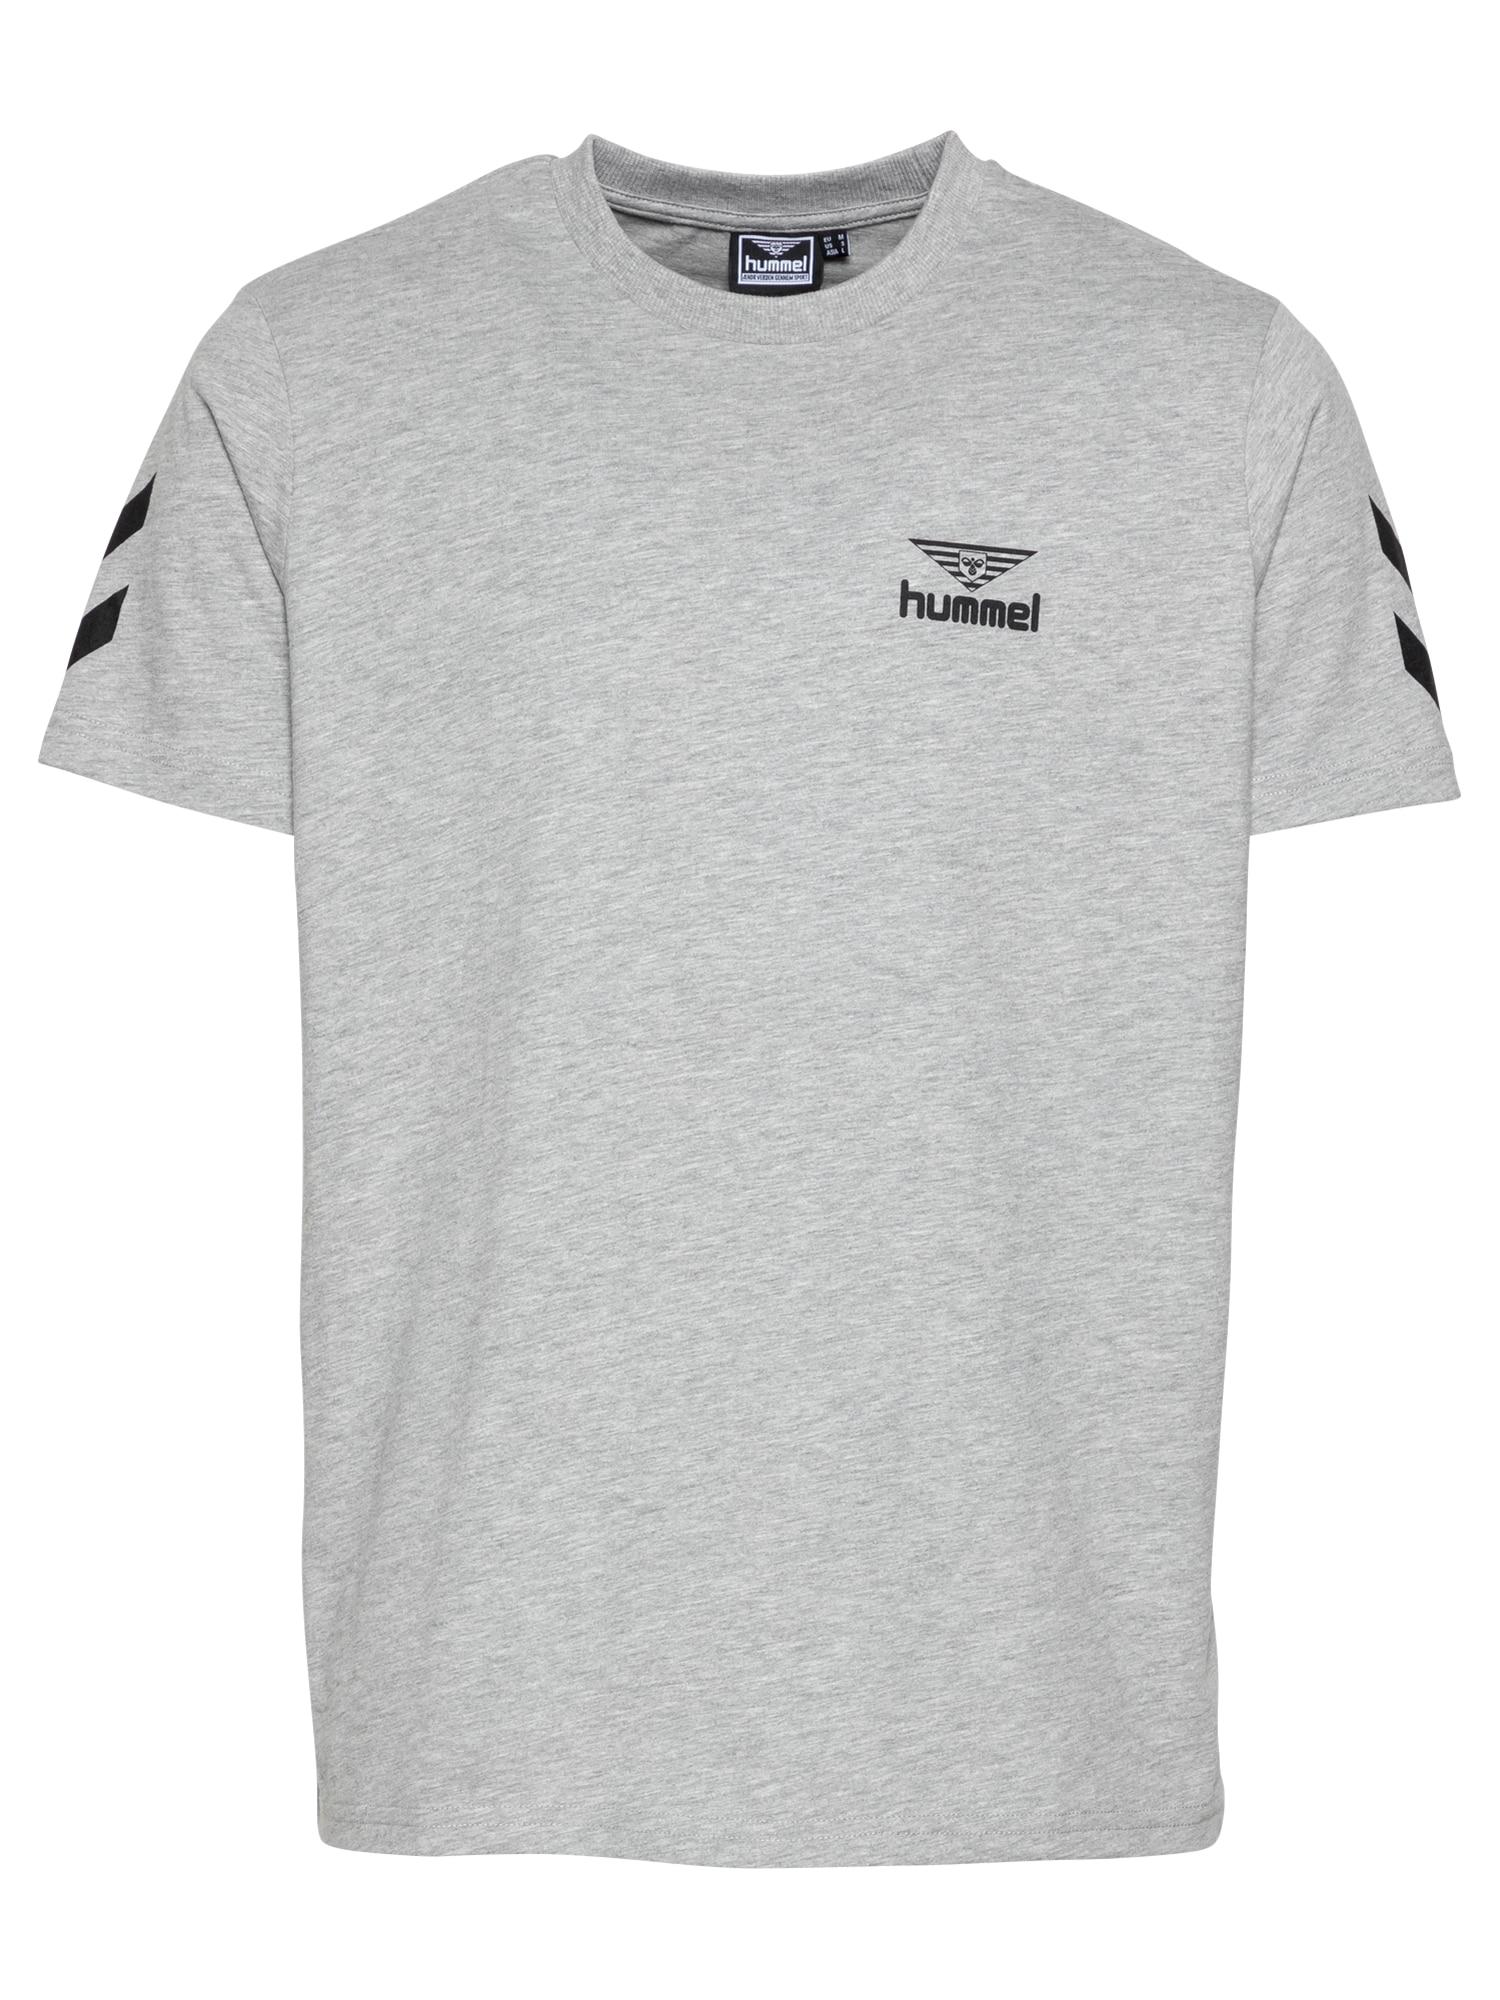 hummel hive Marškinėliai margai pilka / juoda